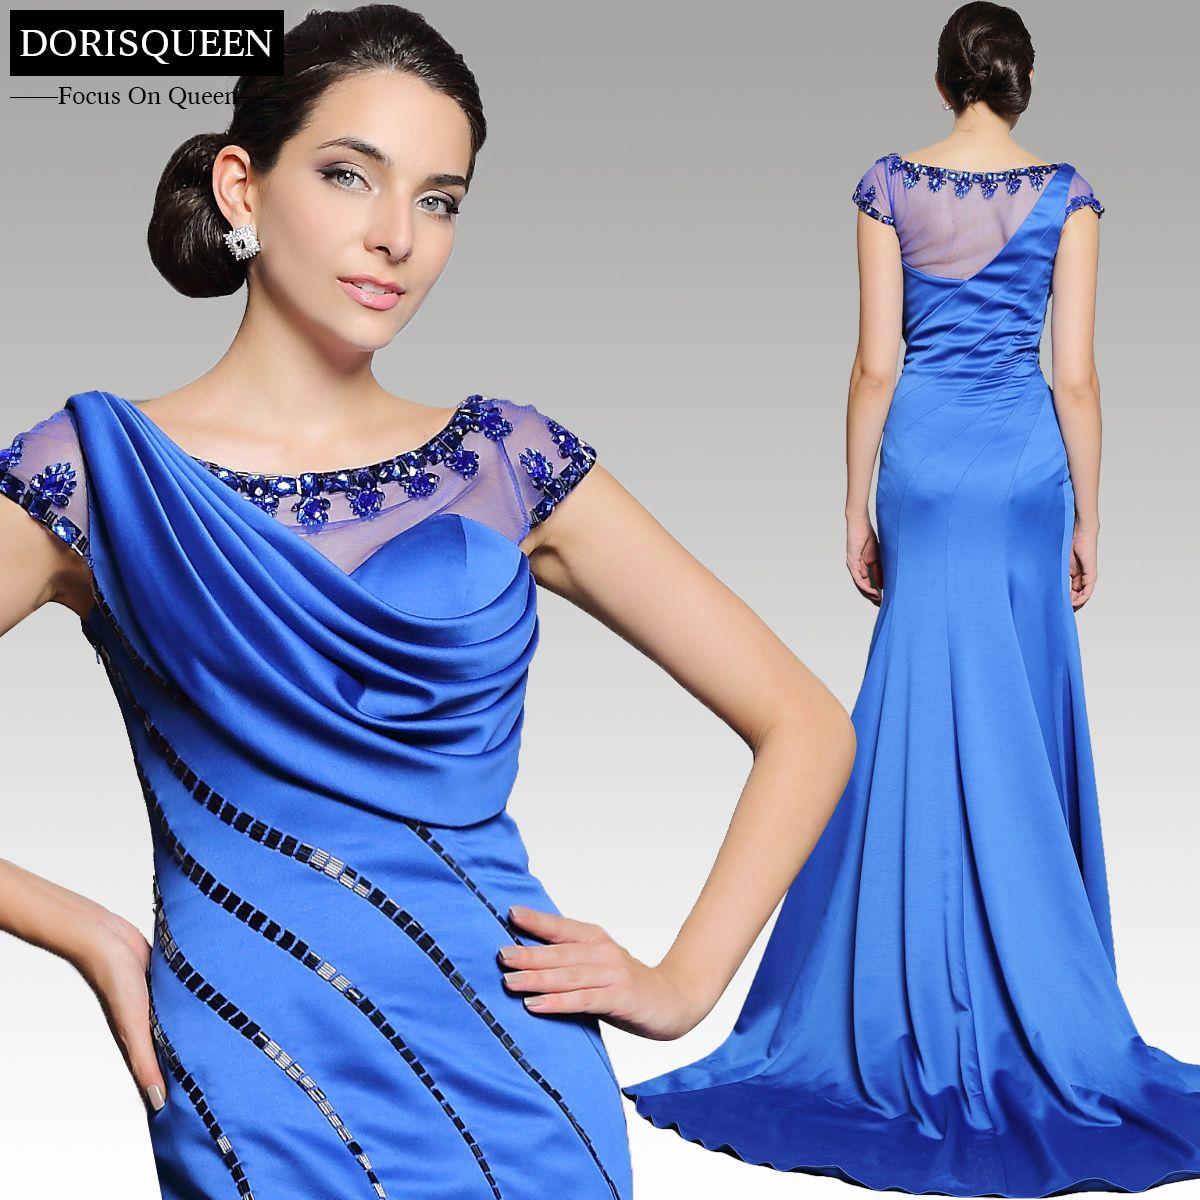 Affordable ready to wear royal blue mermaid long elegant parties